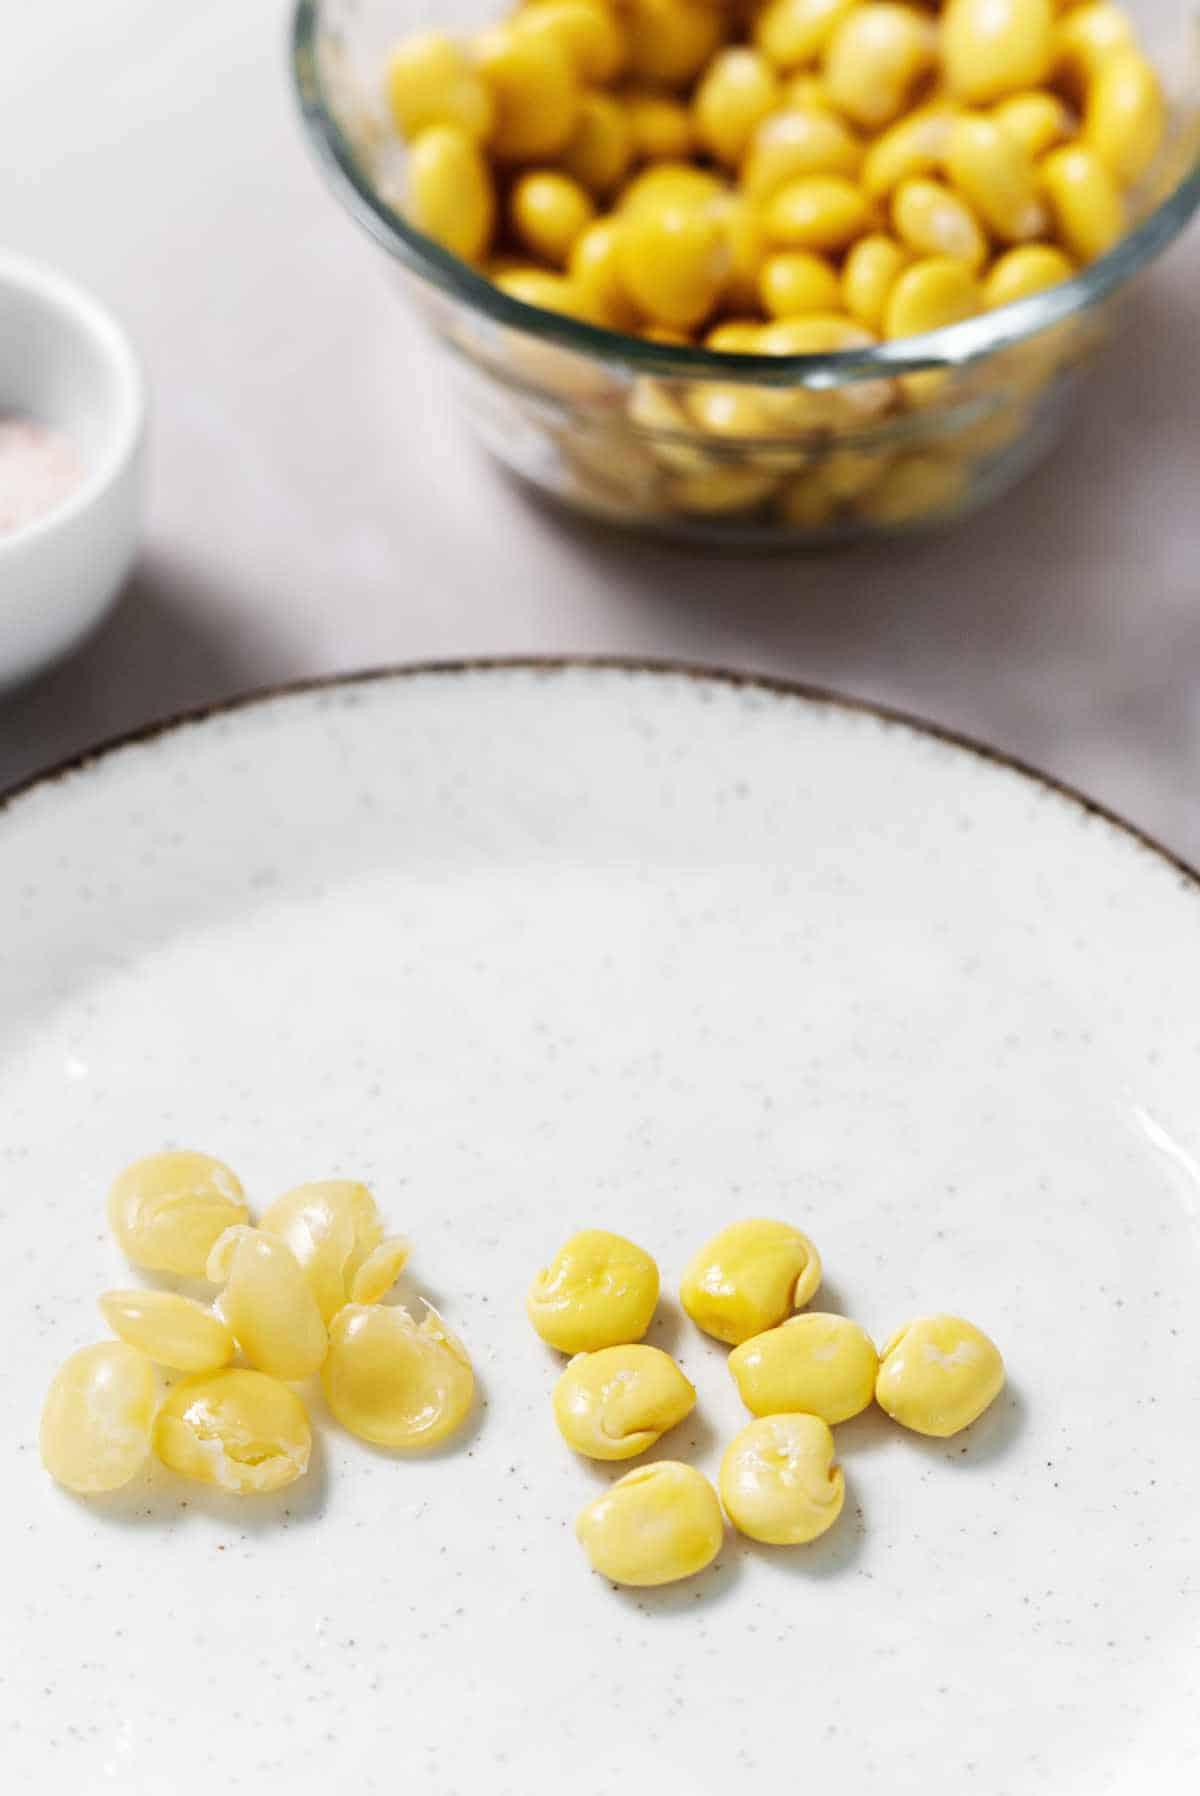 Shelled Lupini Beans